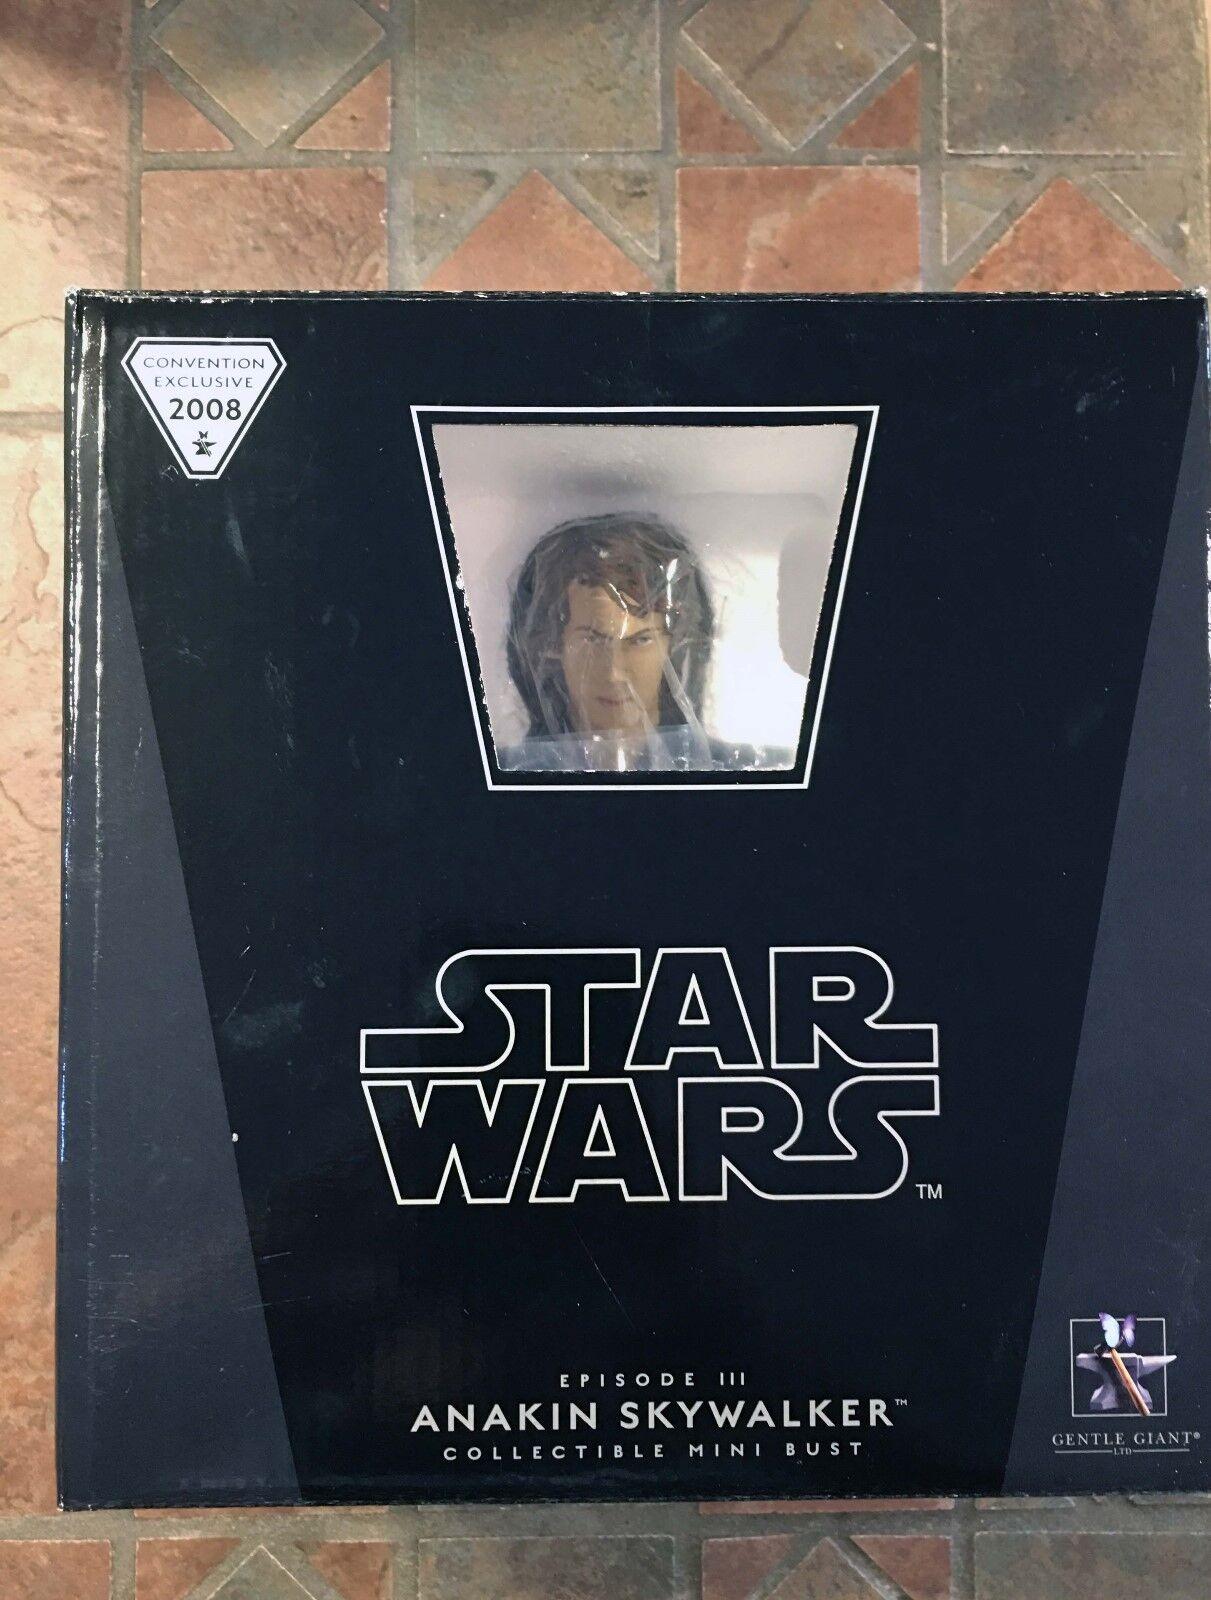 Star Wars Gentle Giant SDCC ANAKIN SKYWALKER Sealed MINI BUST Exclusive  3500